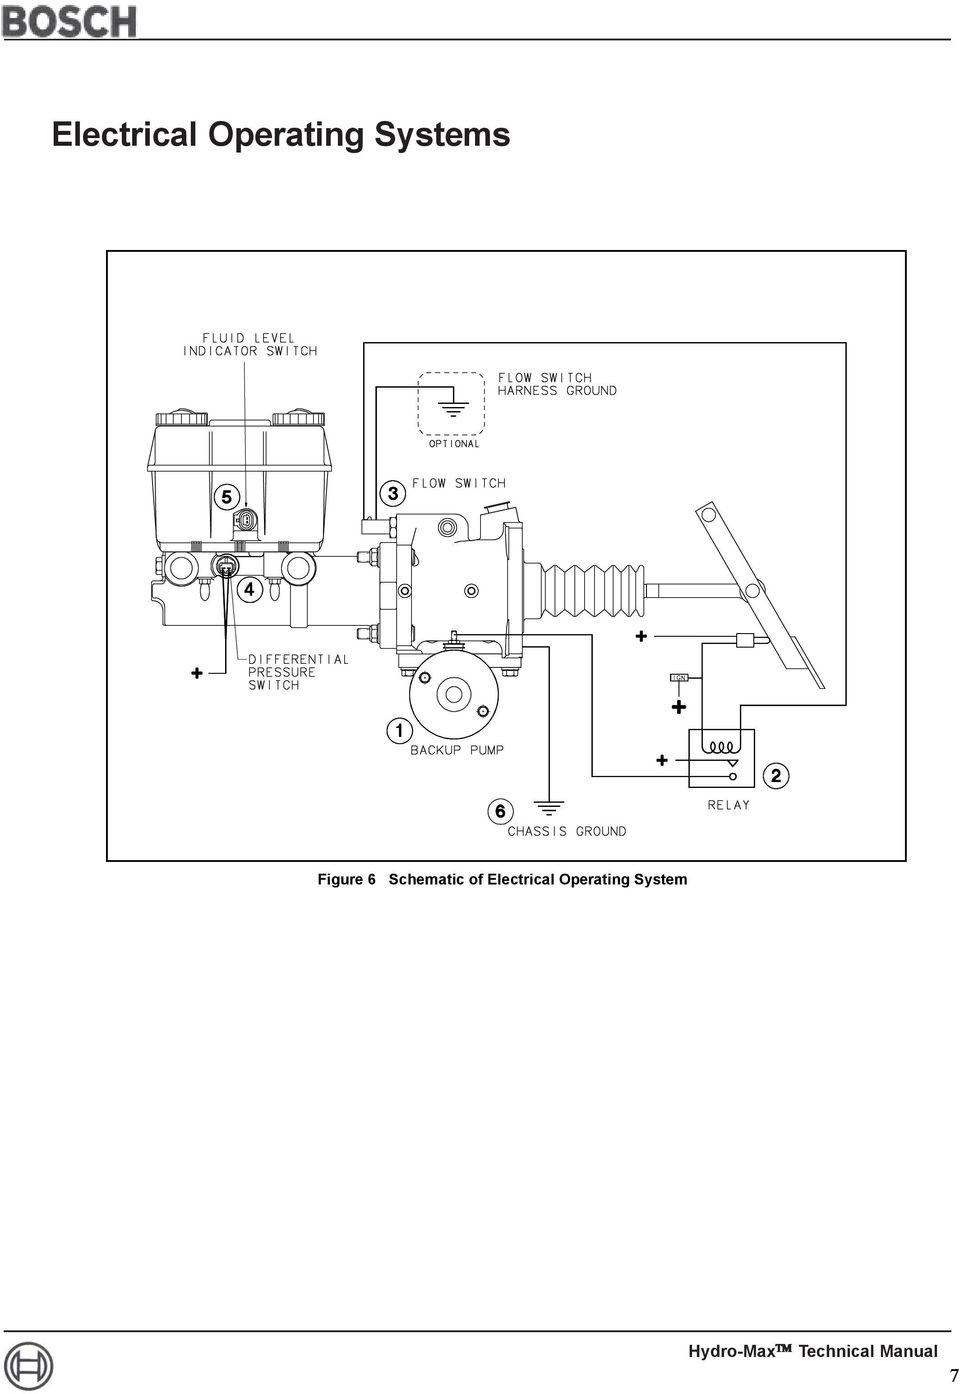 medium resolution of schematic of system